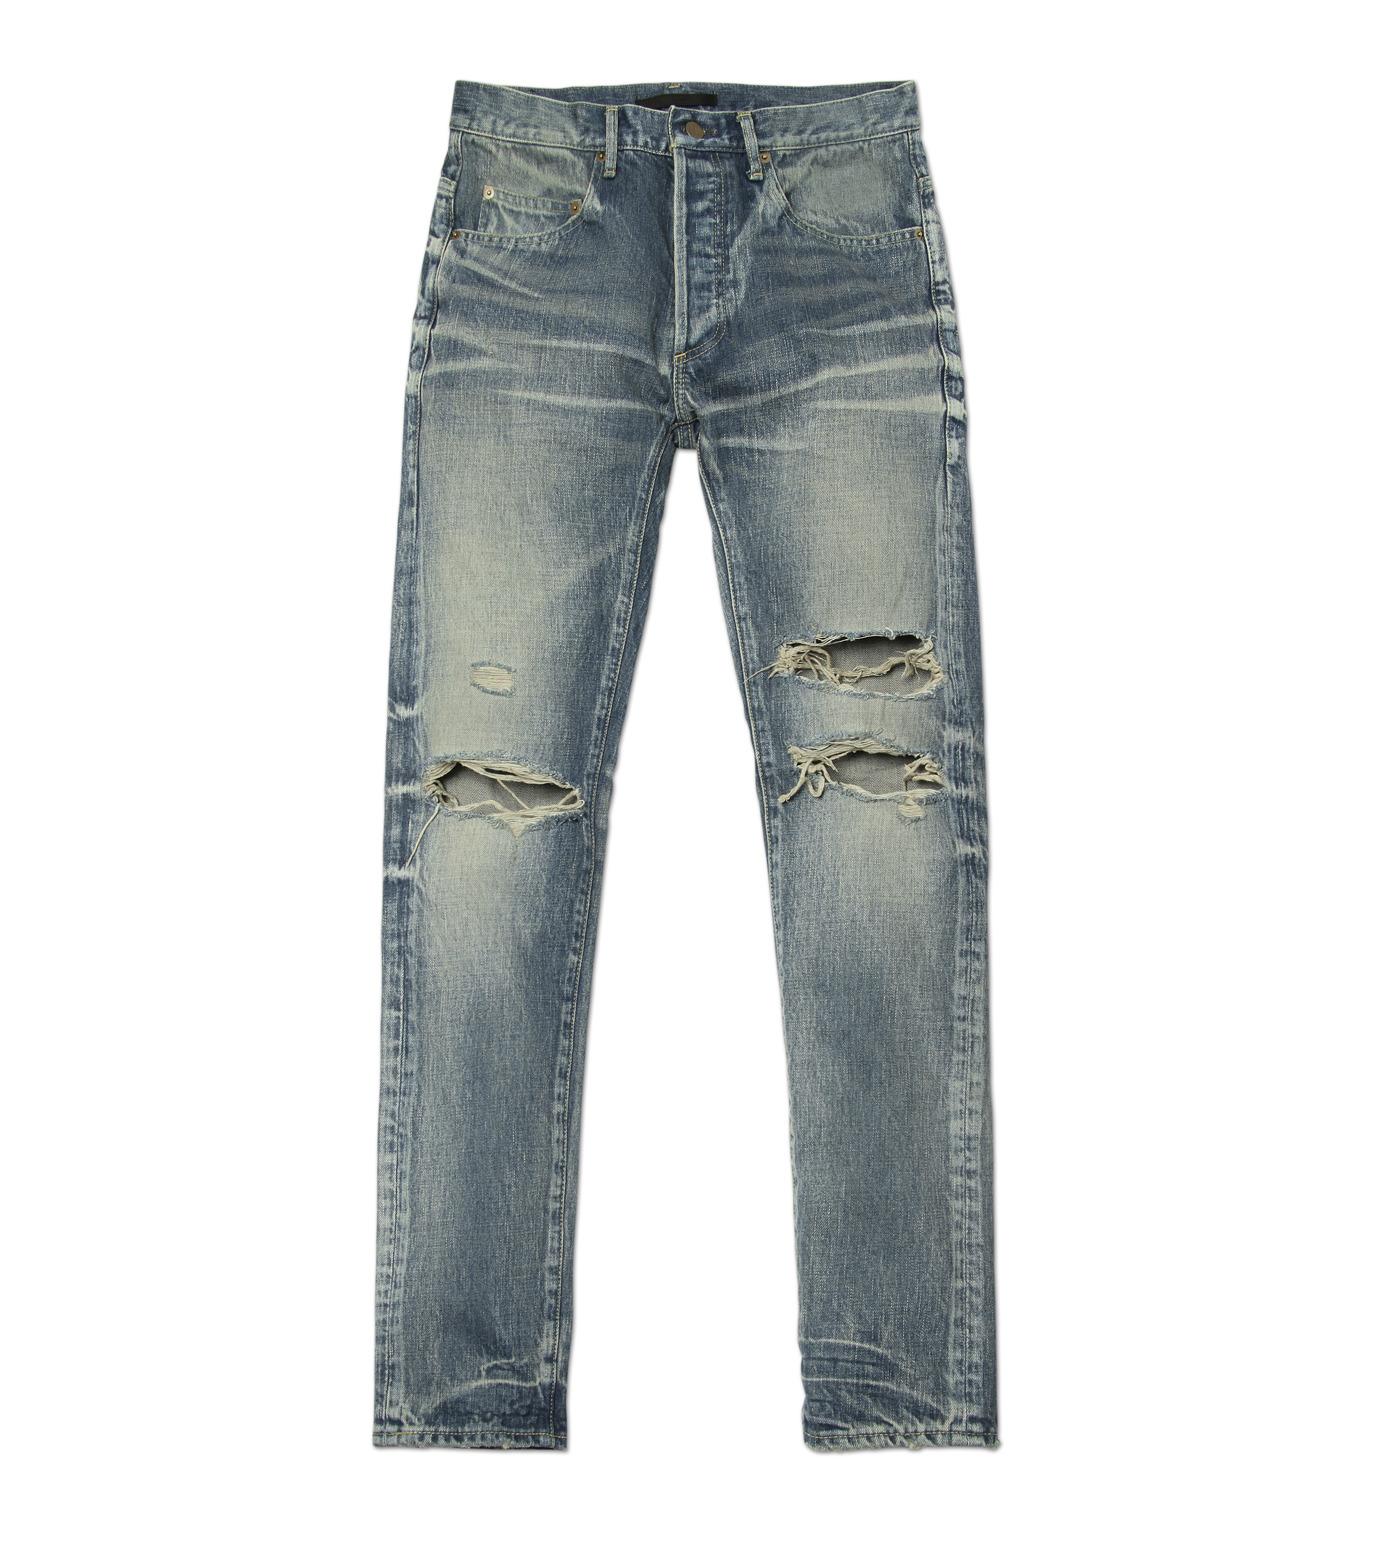 HL HEDDIE LOVU(エイチエル・エディールーヴ)のDamage Denim PT-BLUE(パンツ/pants)-17S98003-92 拡大詳細画像4